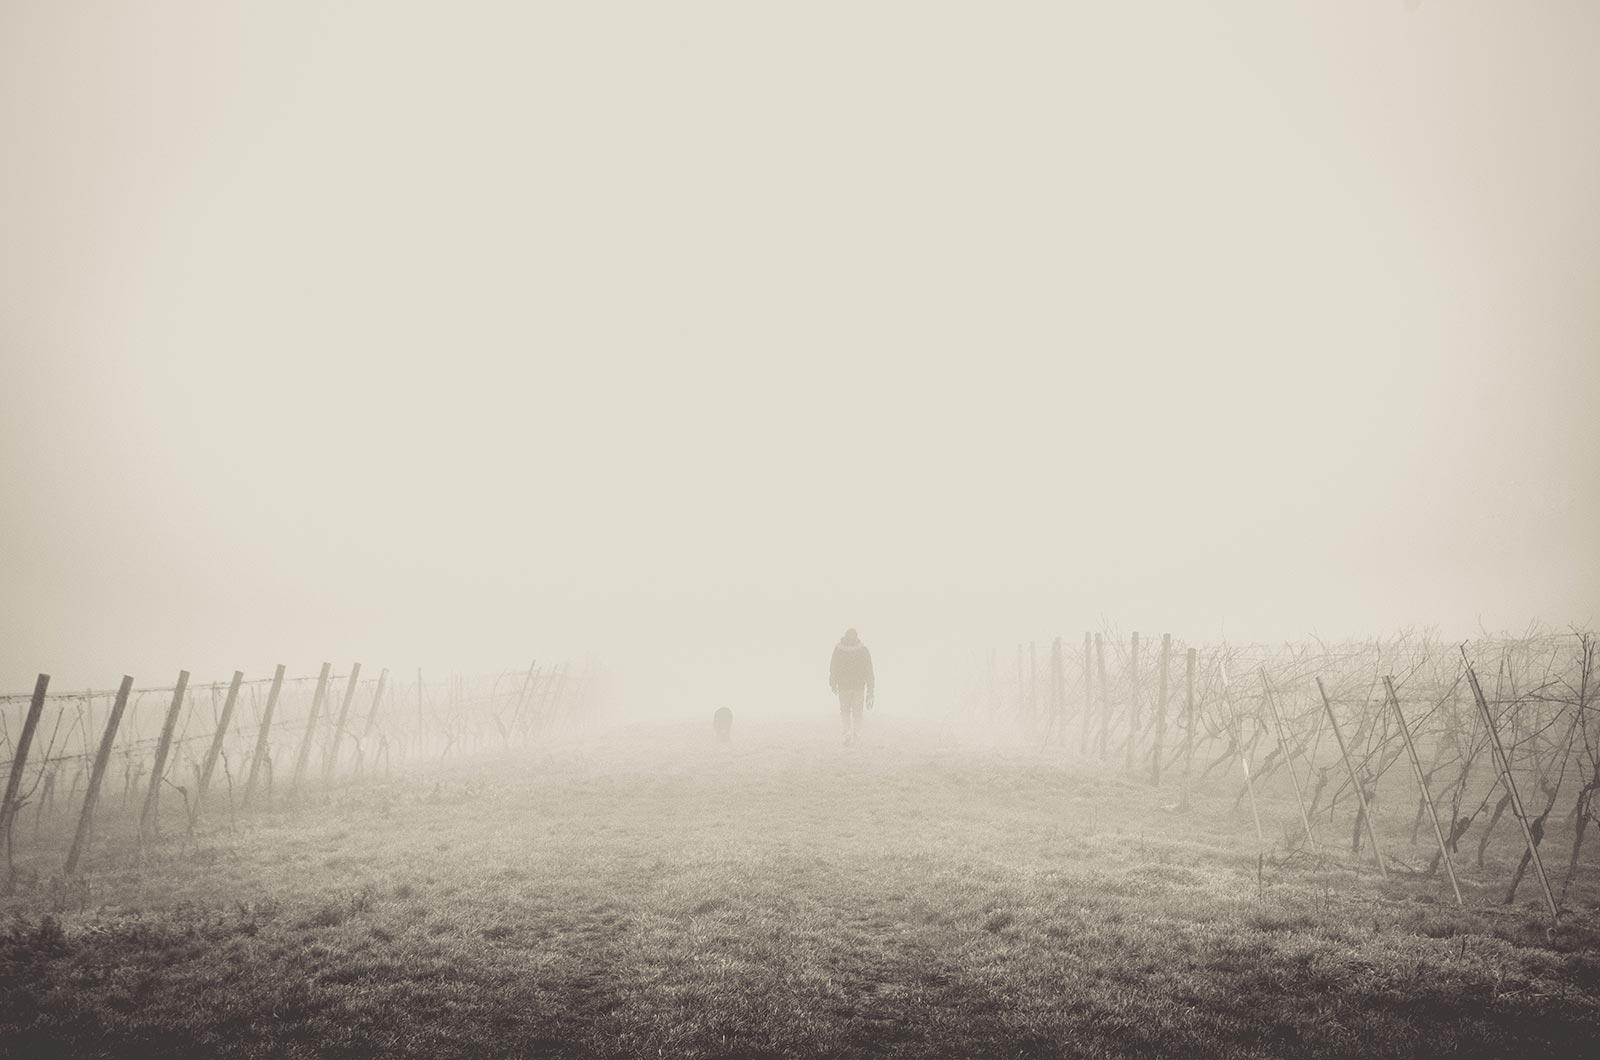 Man and dog walking down road through fog